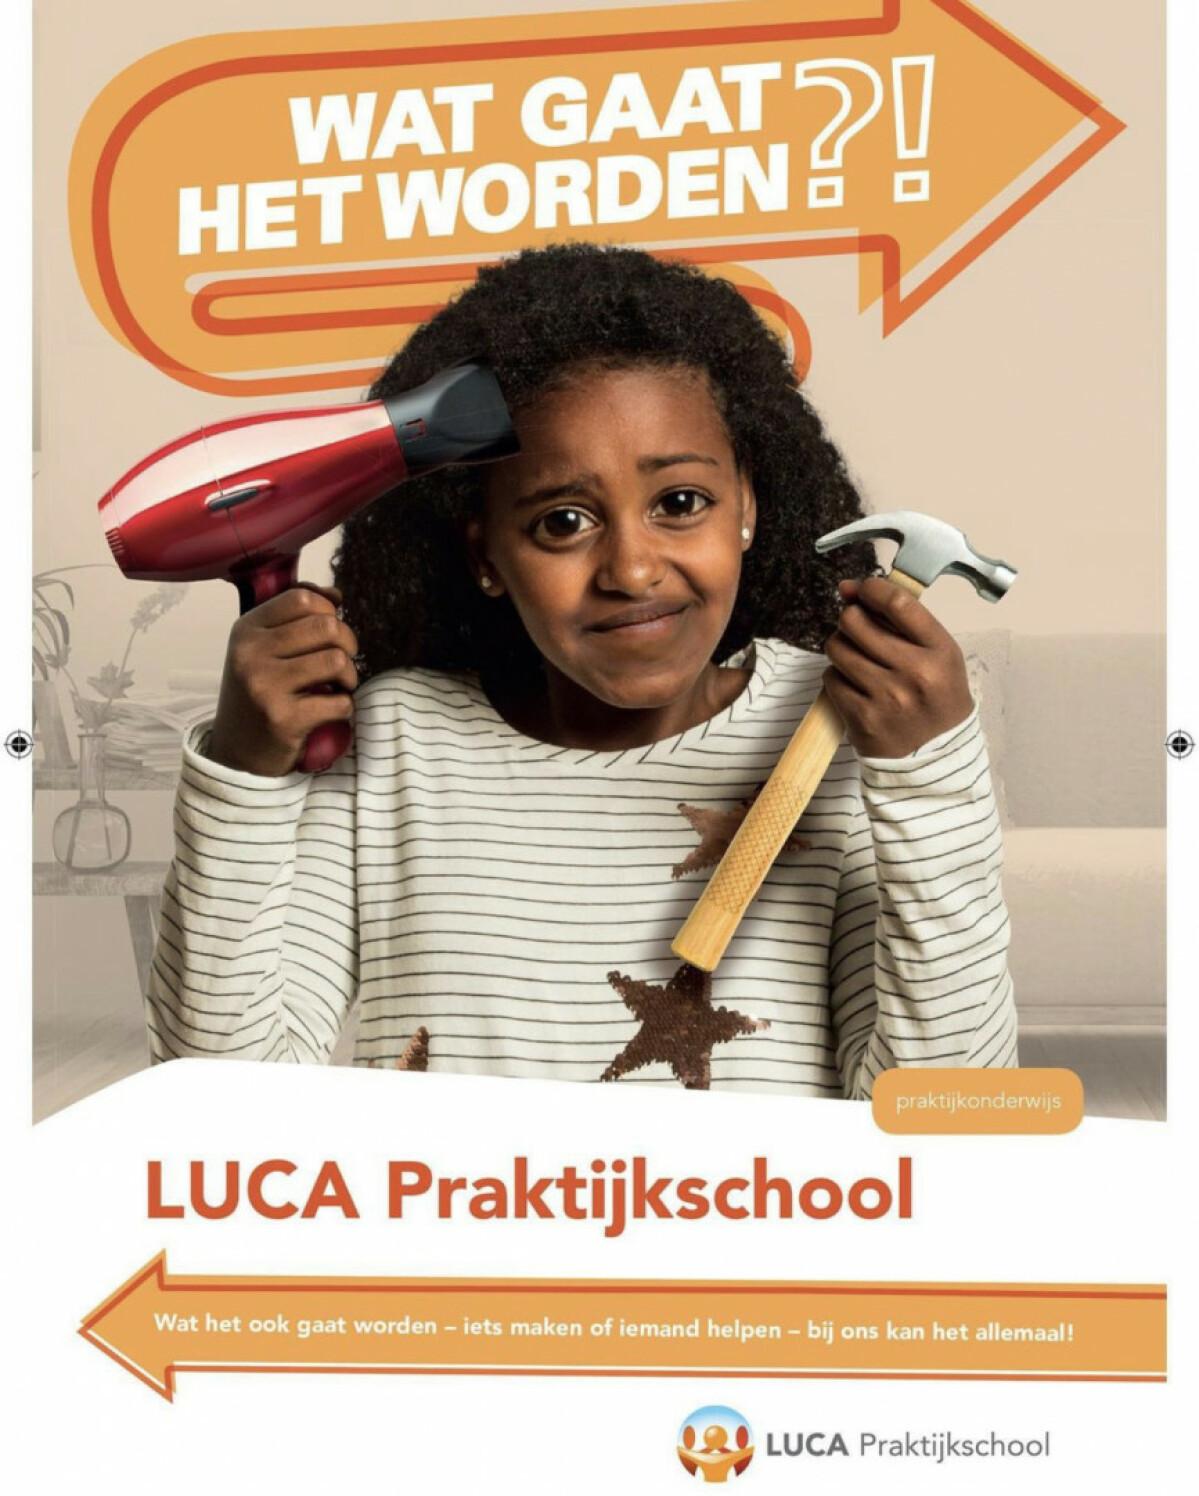 Luca Praktijkschol